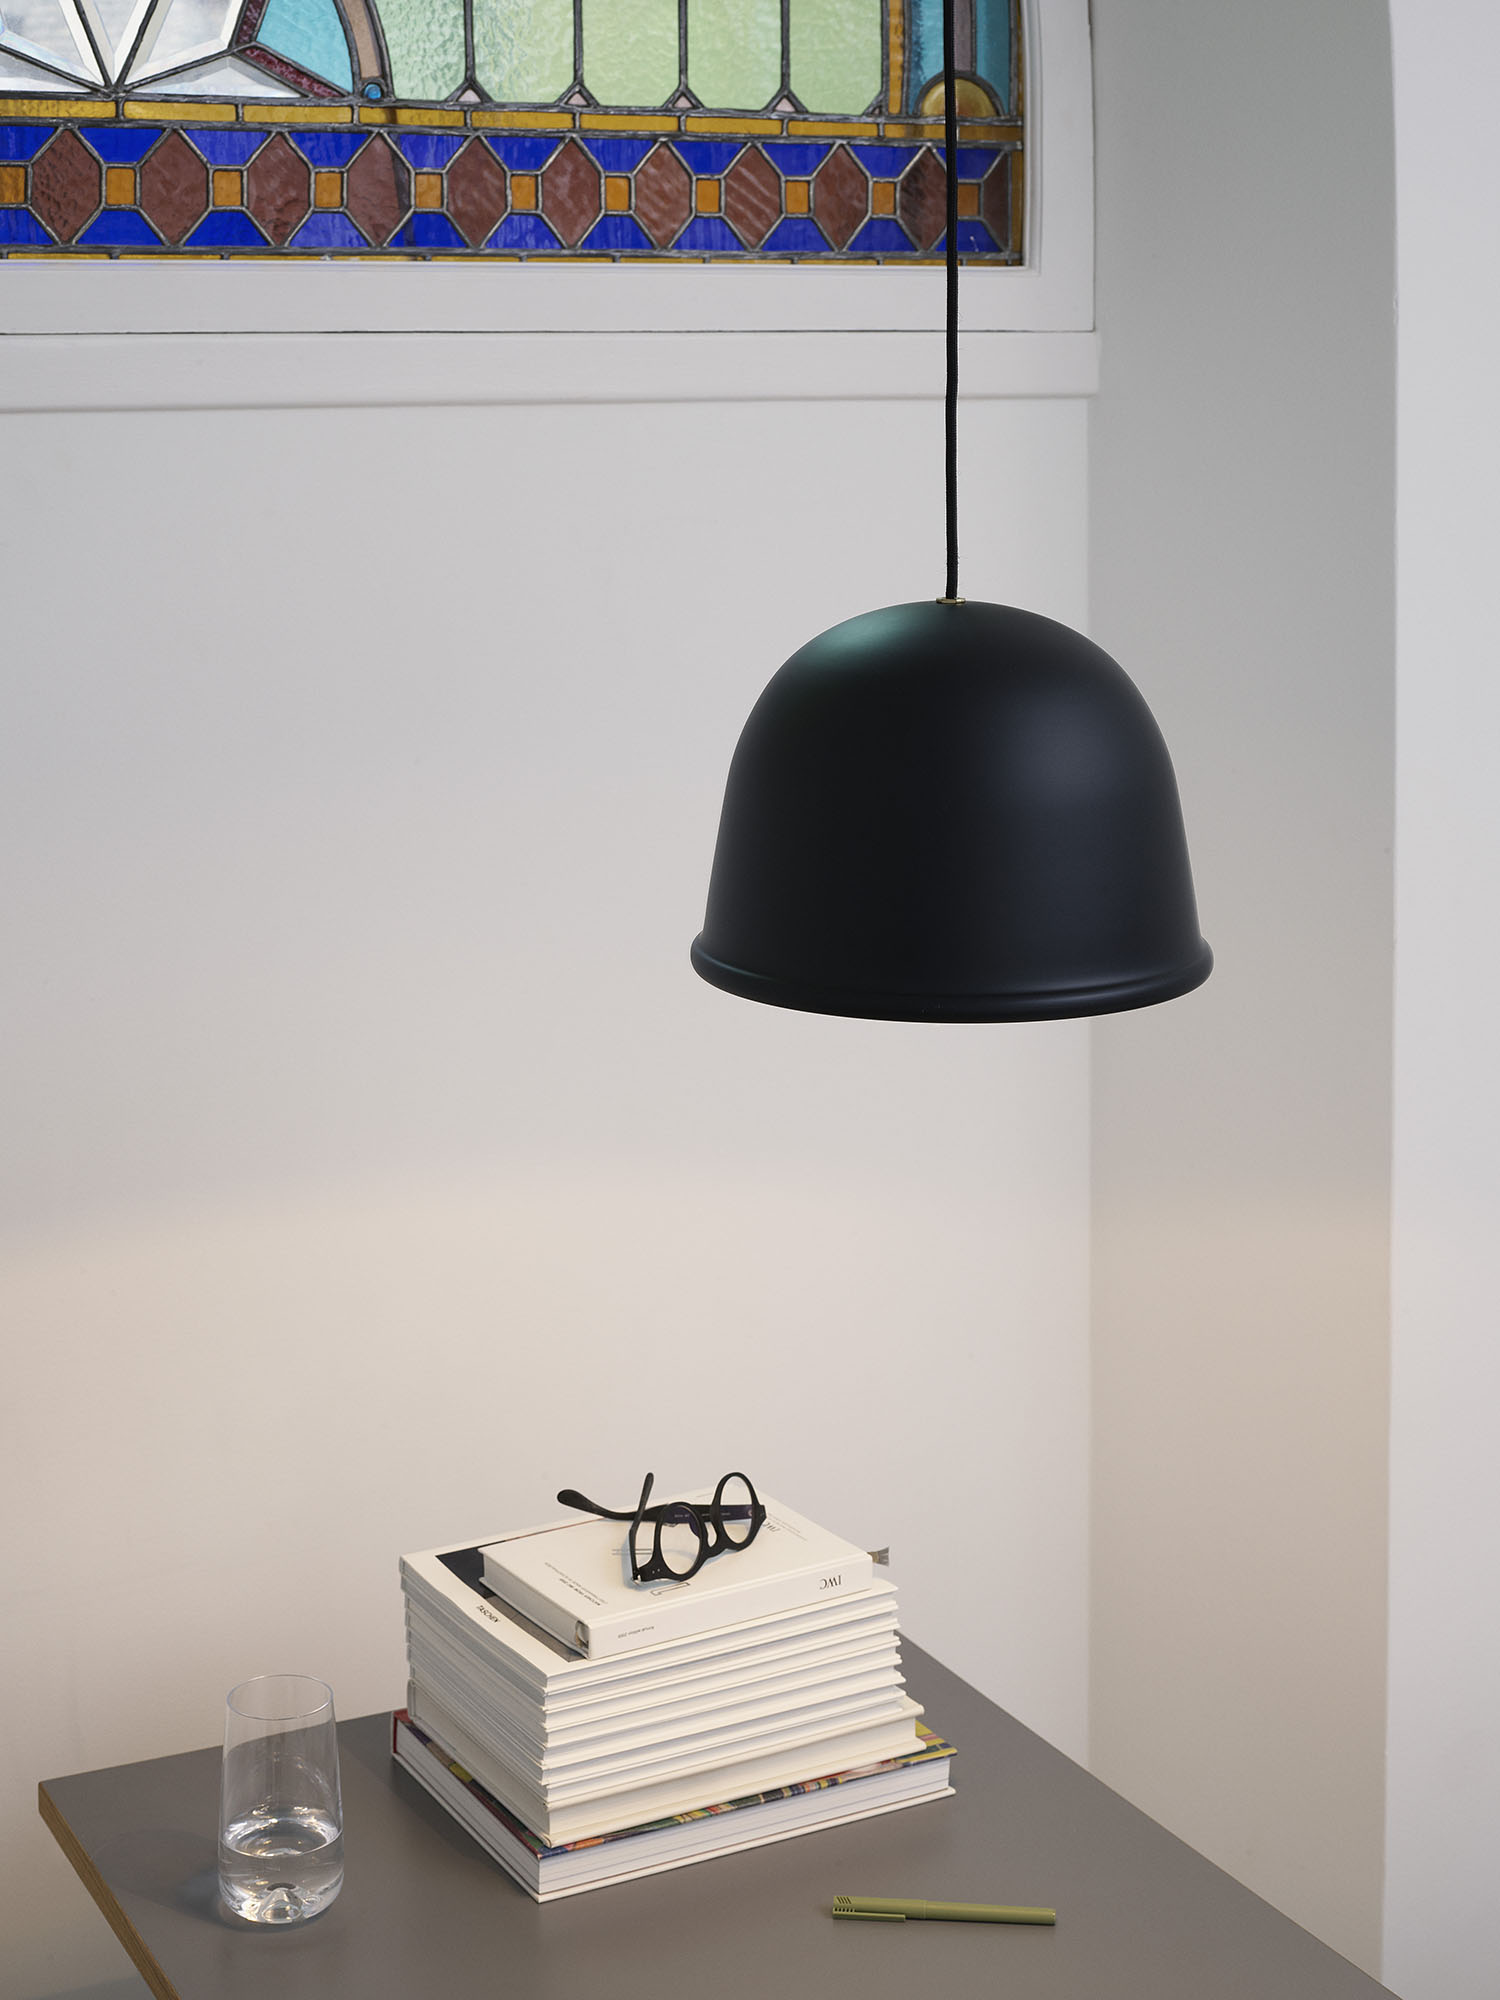 502179_Normann_Copenhagen_Local_Lamp_Black_04_1500x2000